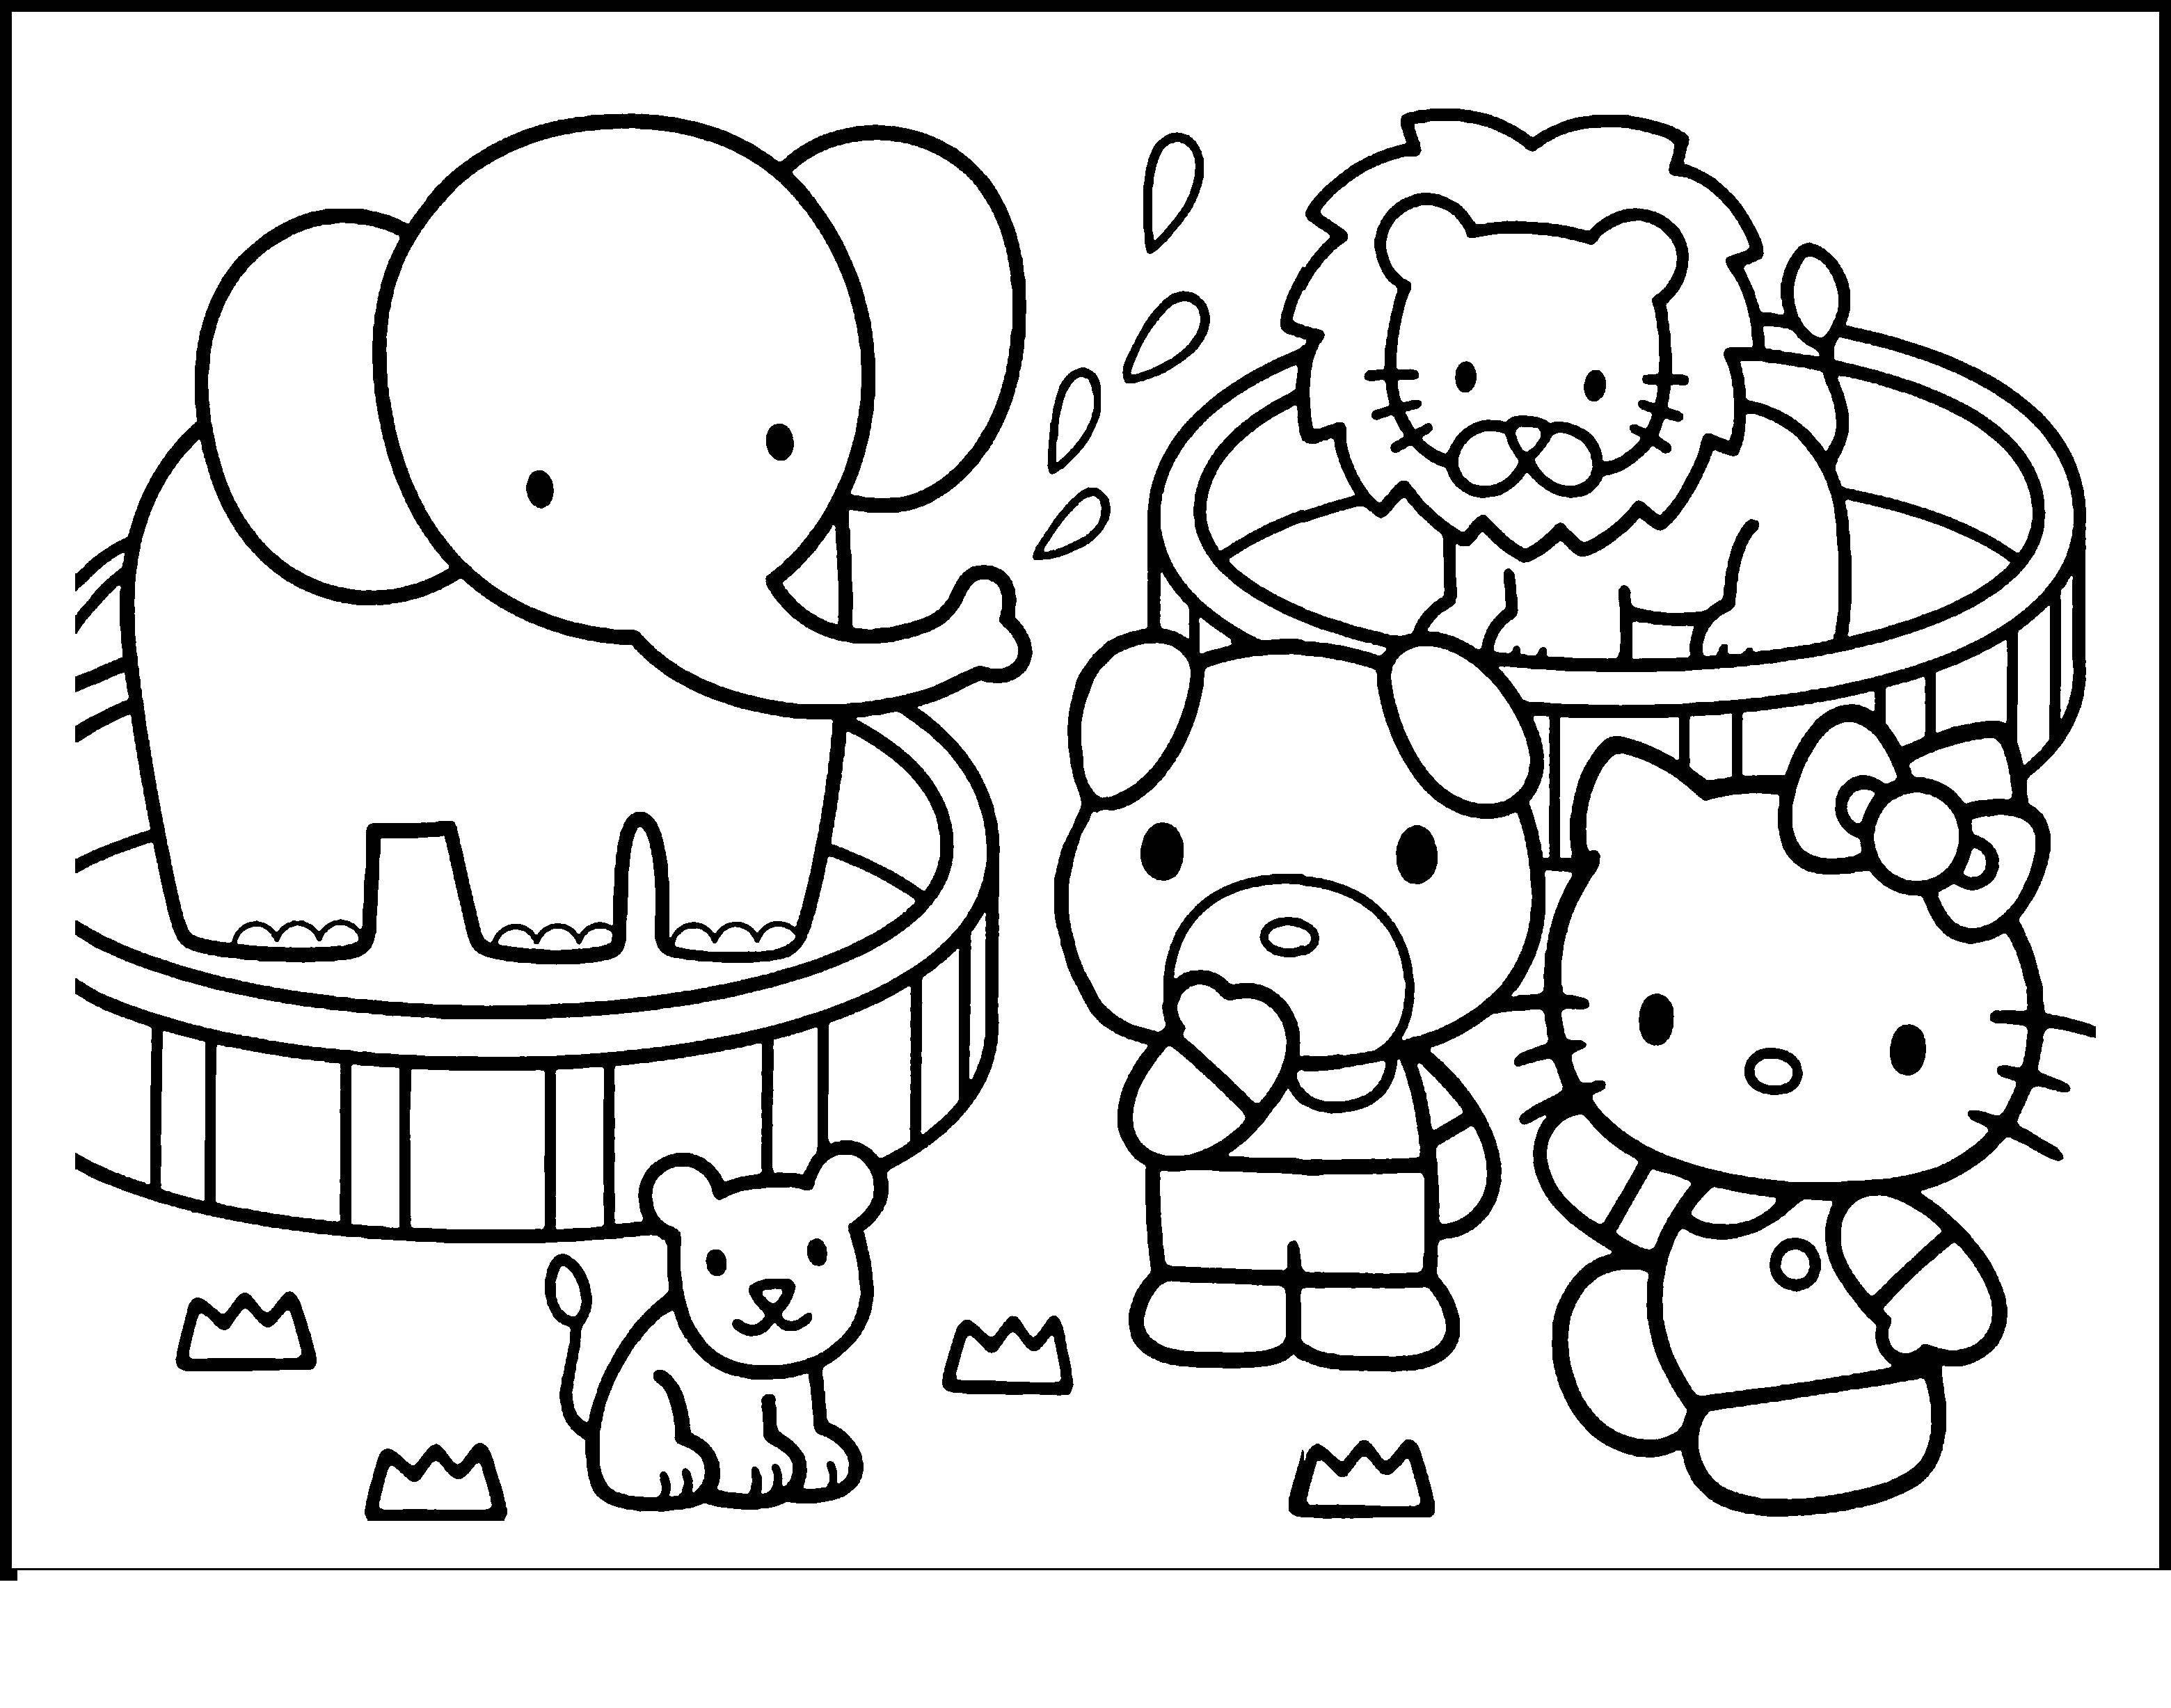 Раскраска Hello Kitty Скачать ,Hello Kitty, слон, тигр,.  Распечатать